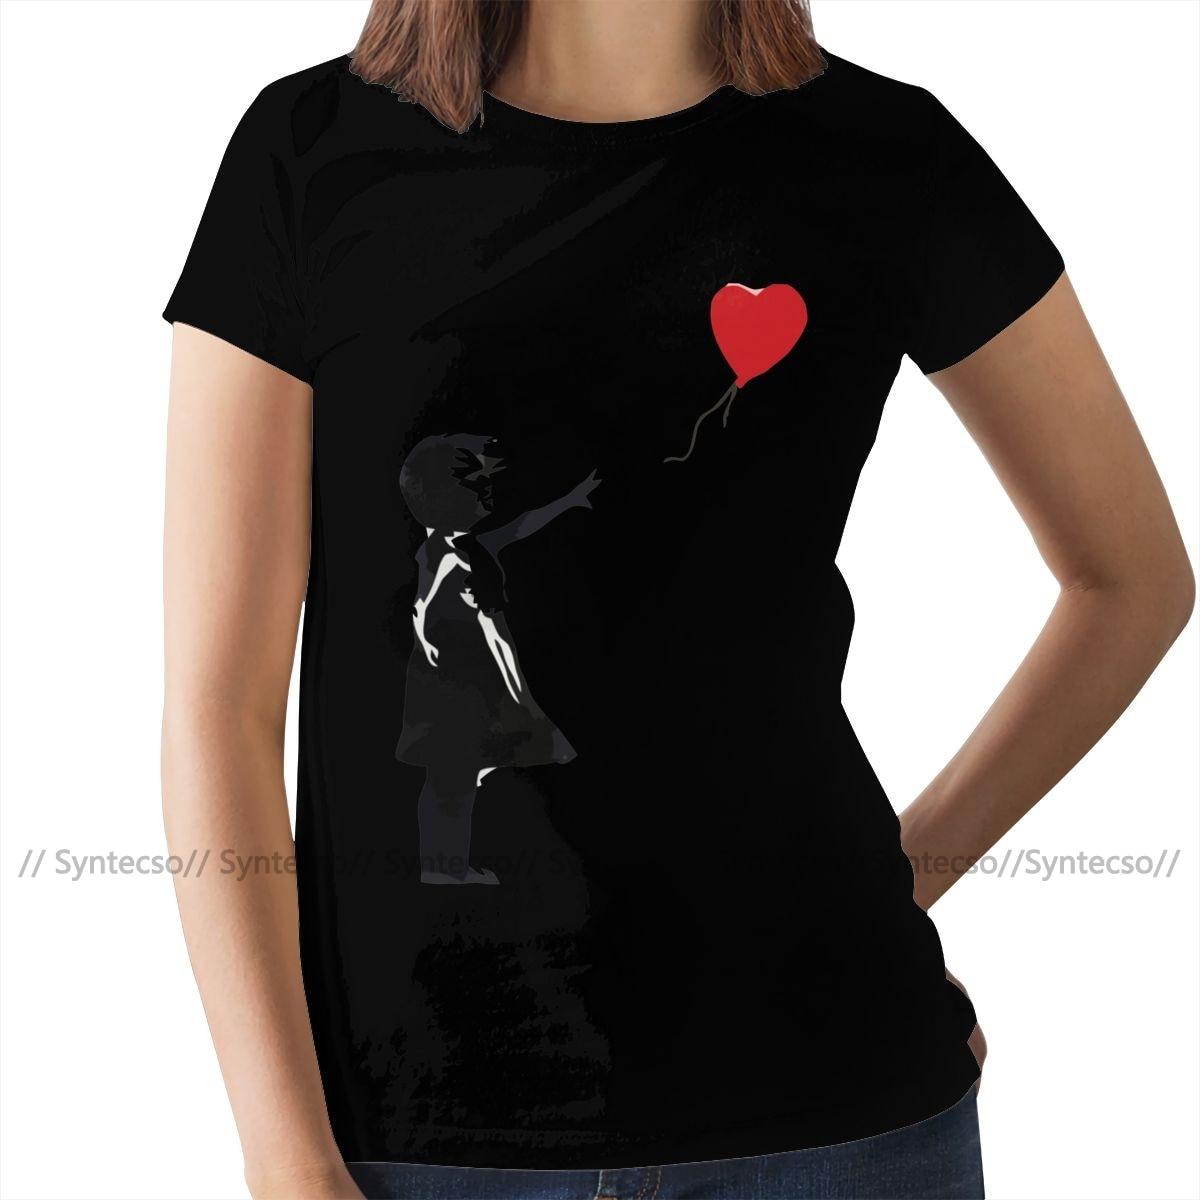 Heart Love T-Shirt Banksy Girl With Balloon T Shirt Trendy Purple Women tshirt Cotton Graphic Ladies Tee Shirt 3